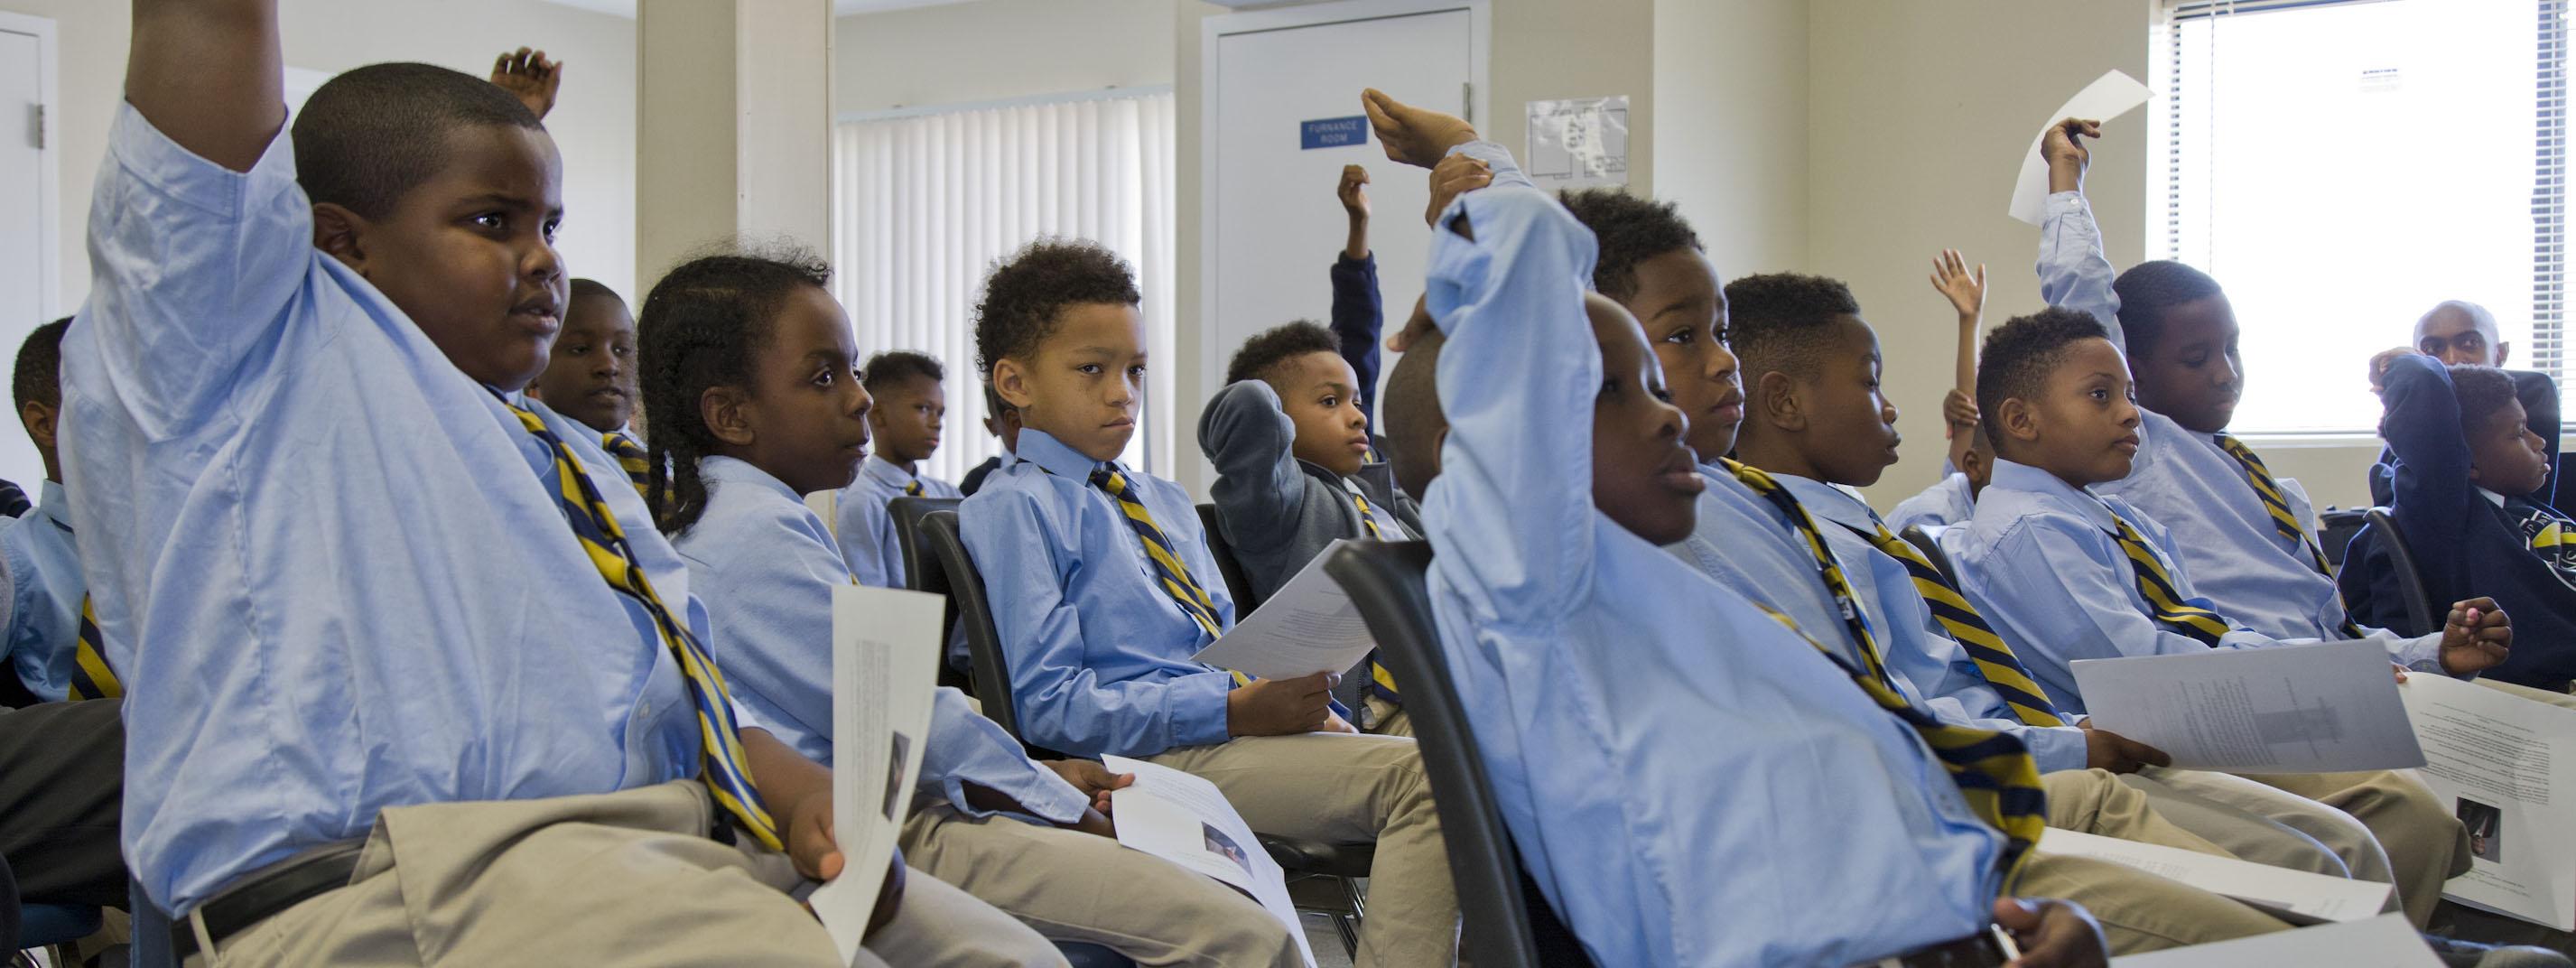 The Bishop Walker School for Boys